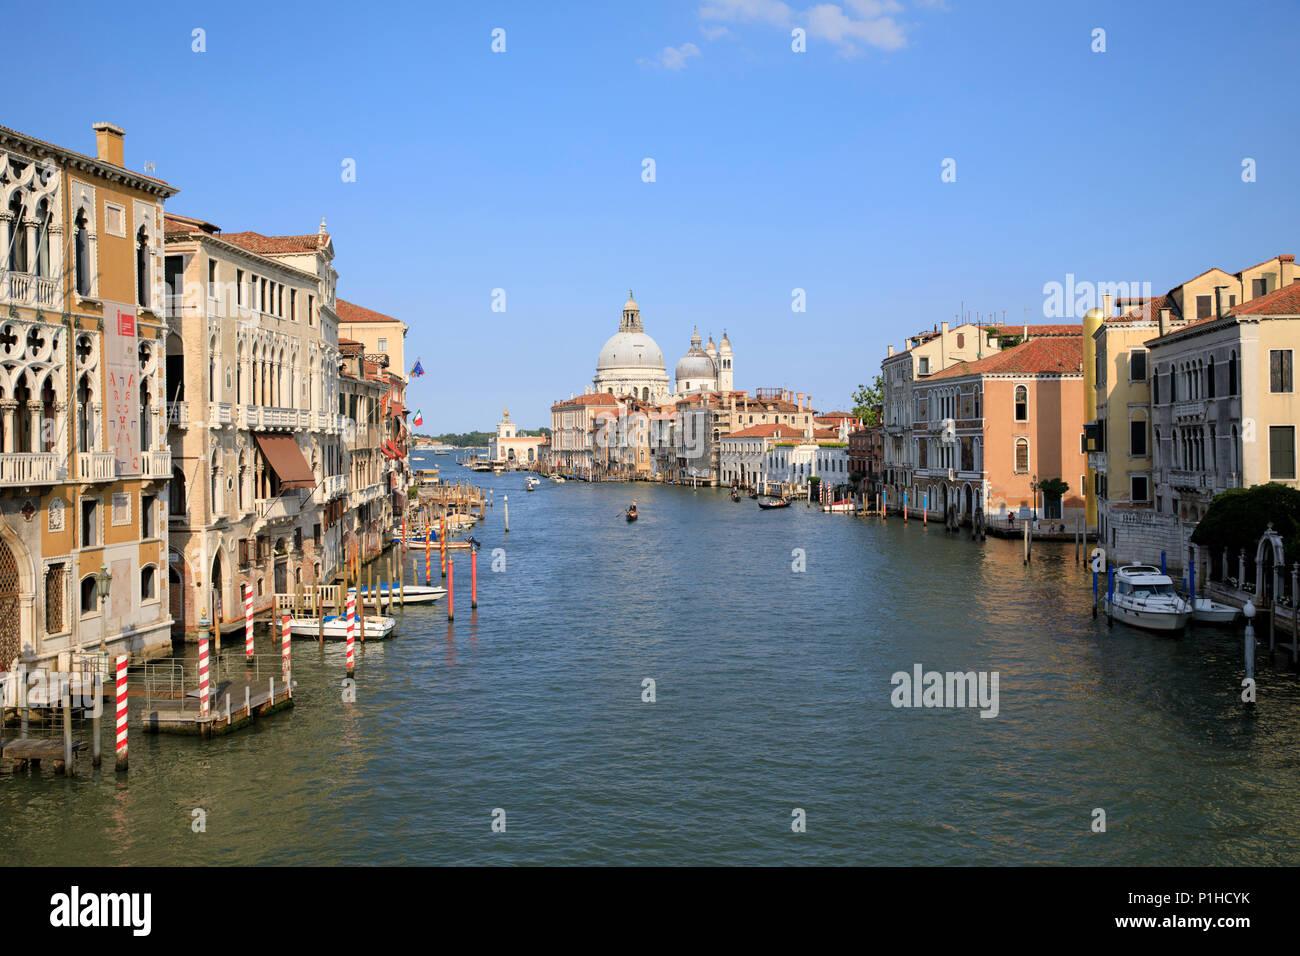 View from the Ponte dell'Accademia looking down the Grand Canal towards Basilica di Santa Maria della Salute. Stock Photo